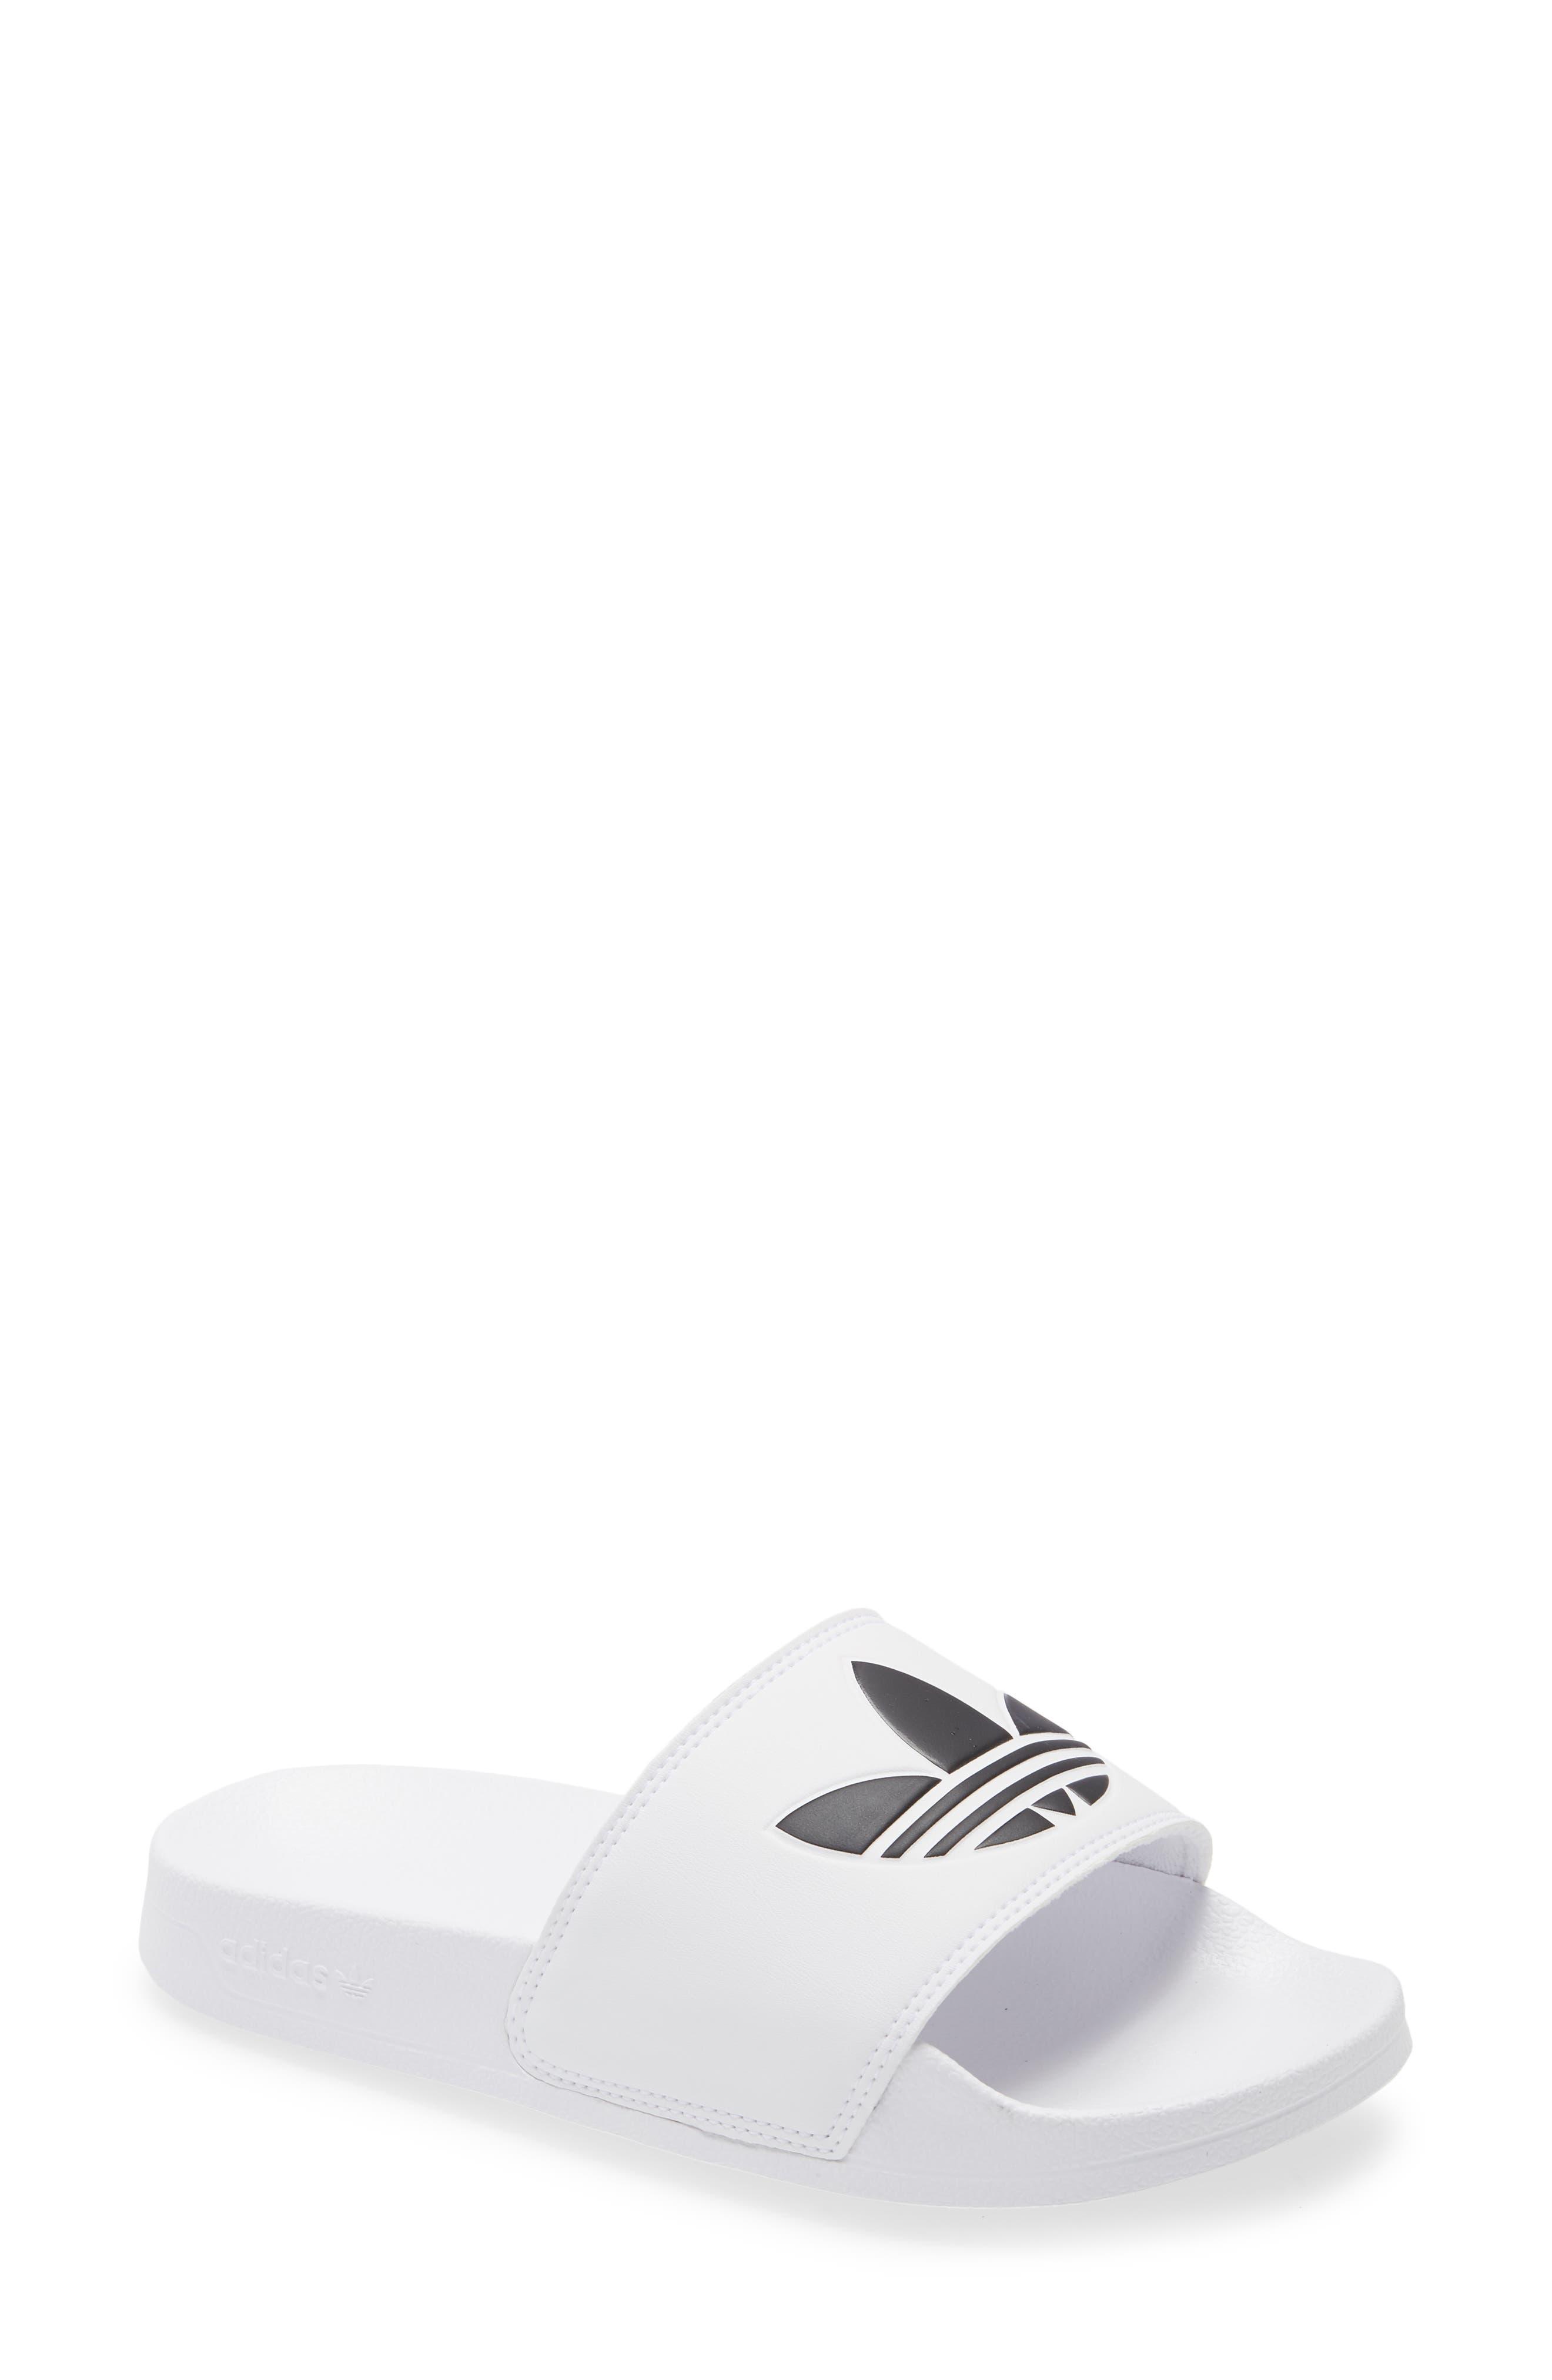 adidas Kid's Adidas Adilette Lite Sport Slide, Size 6 M - White